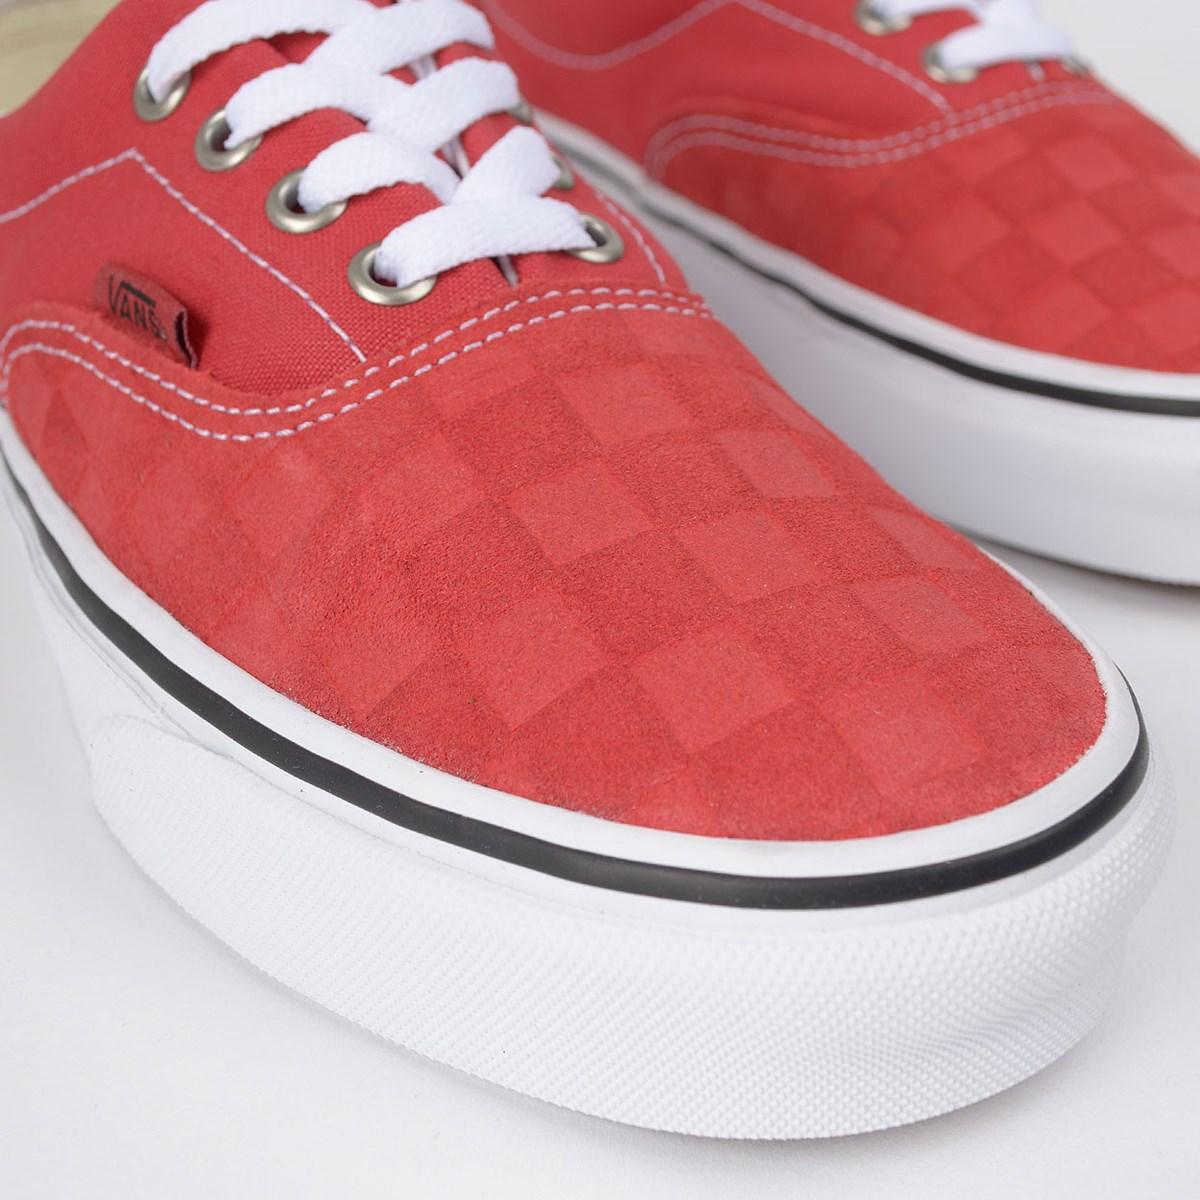 Tênis Vans Era Deboss Checkerboard Pompeian Red VN0A4U39WJ2